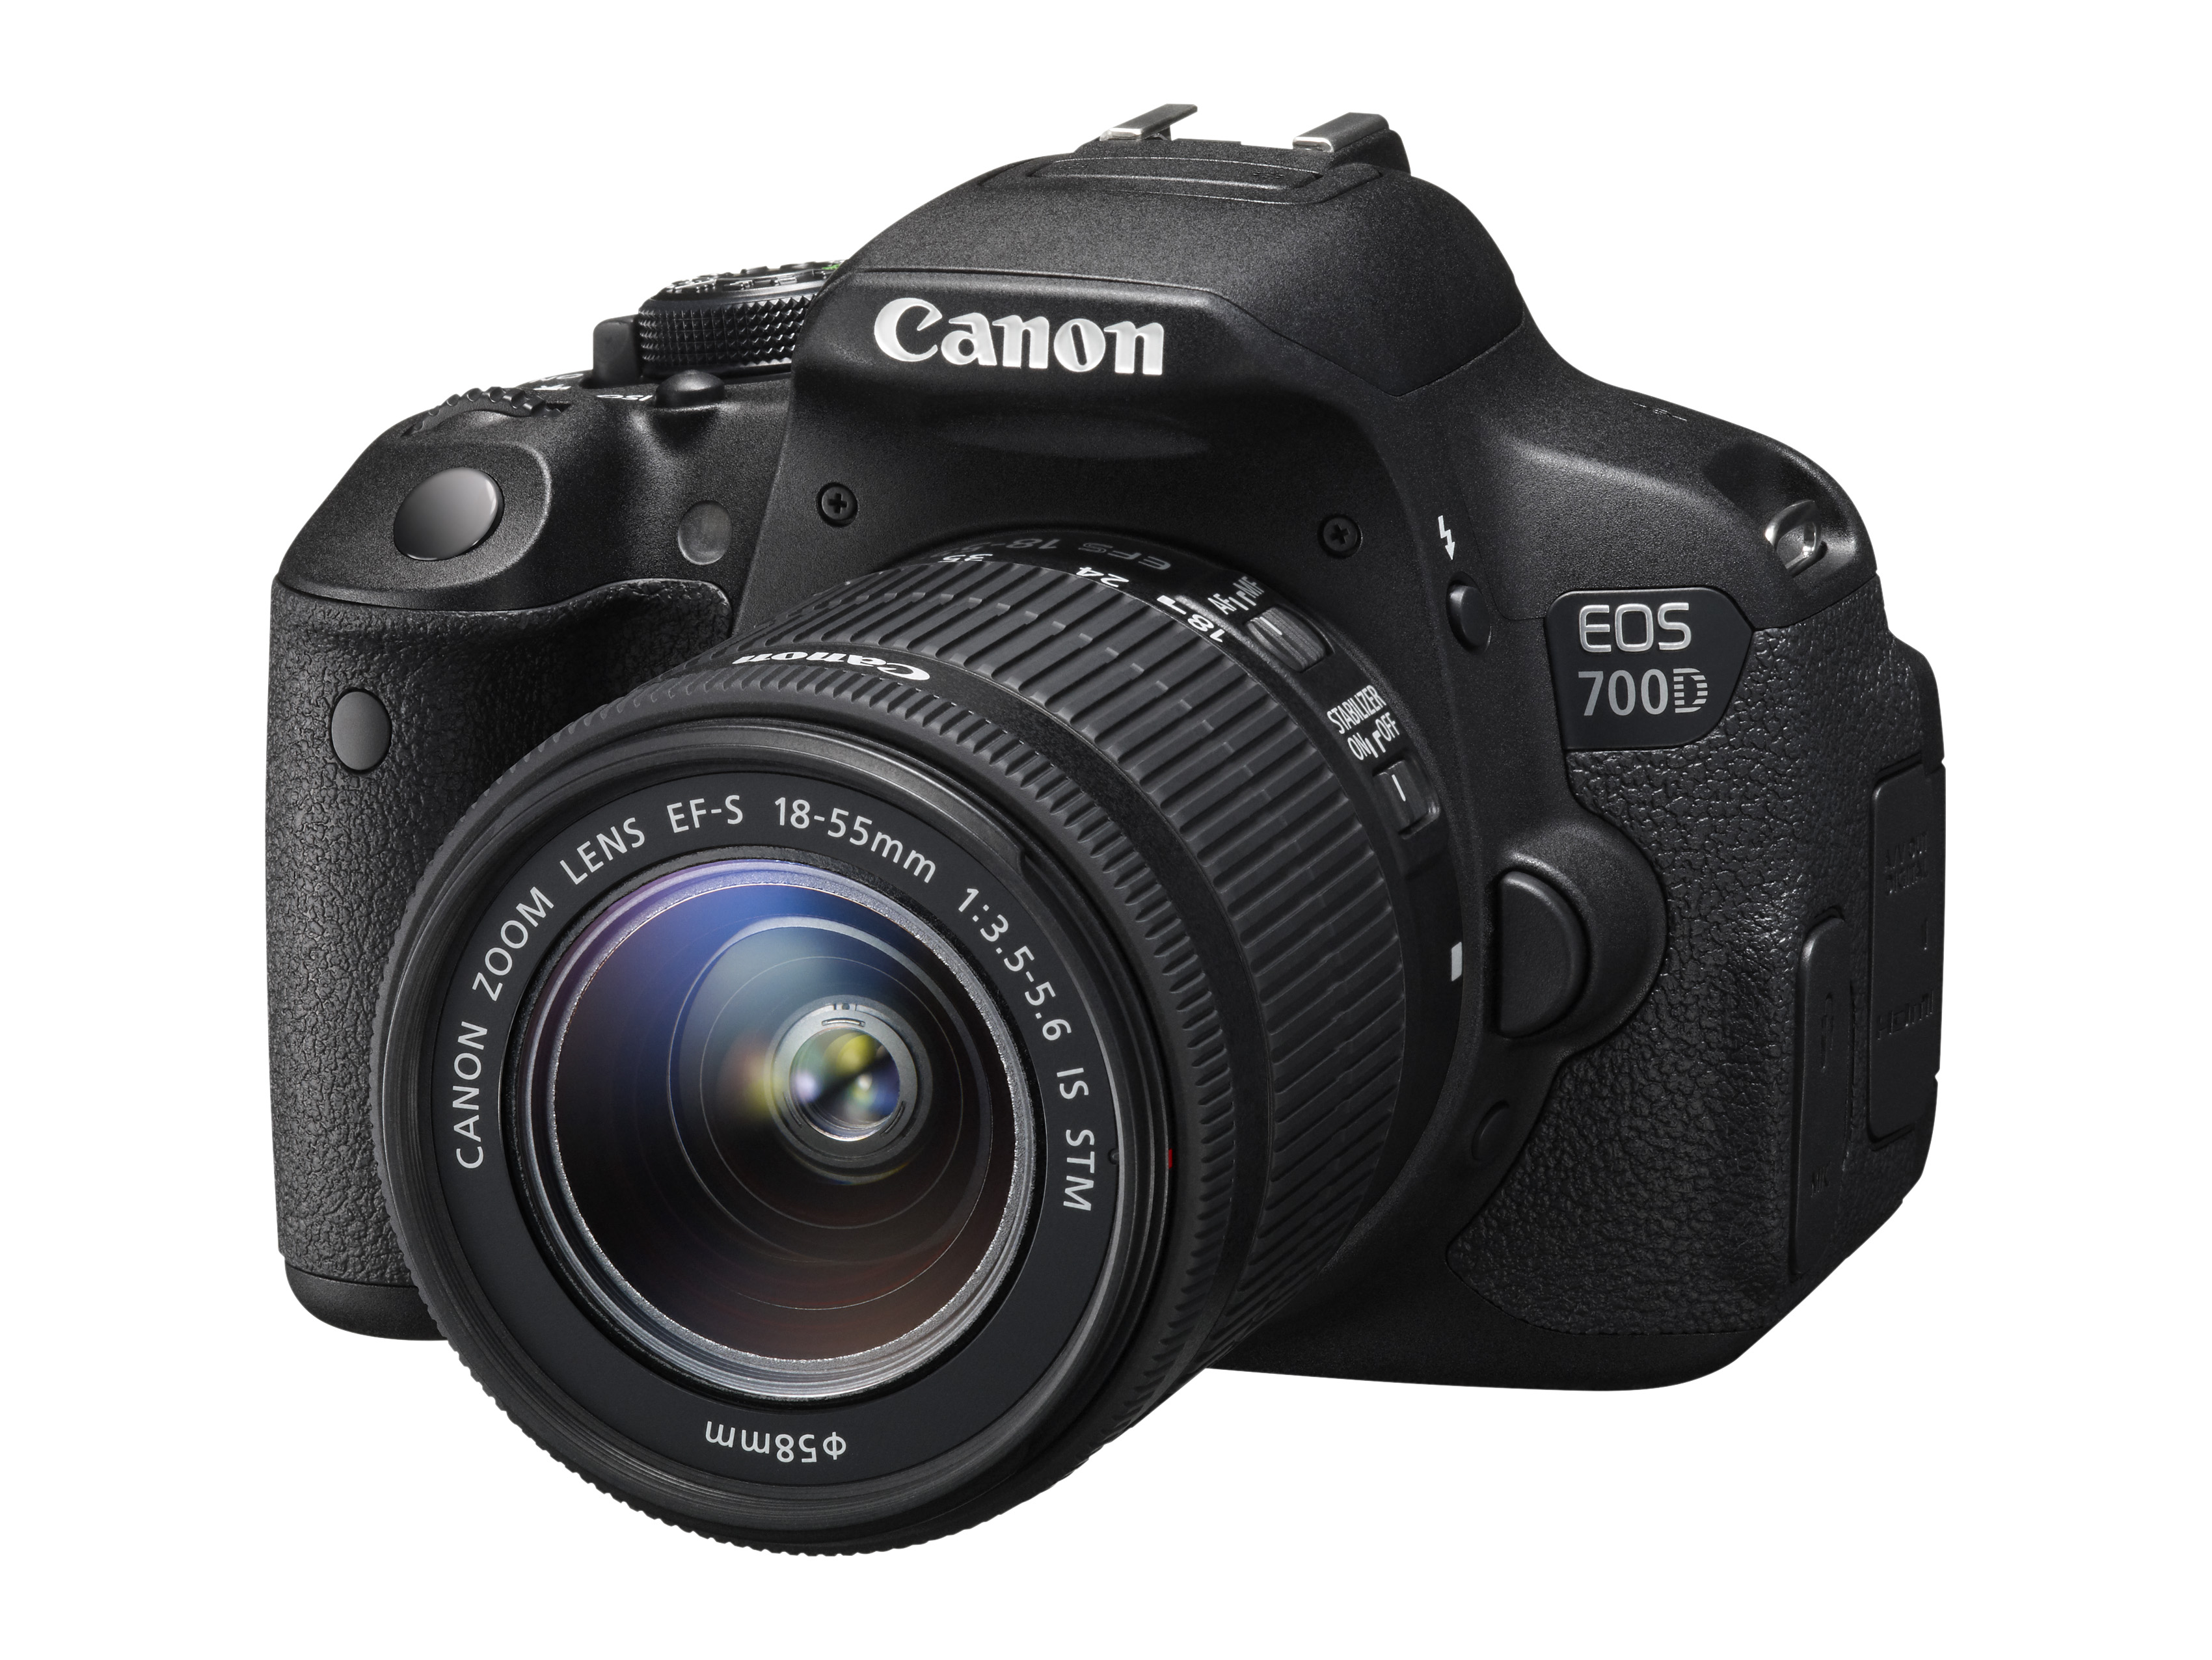 test_Canon_EOS_700D